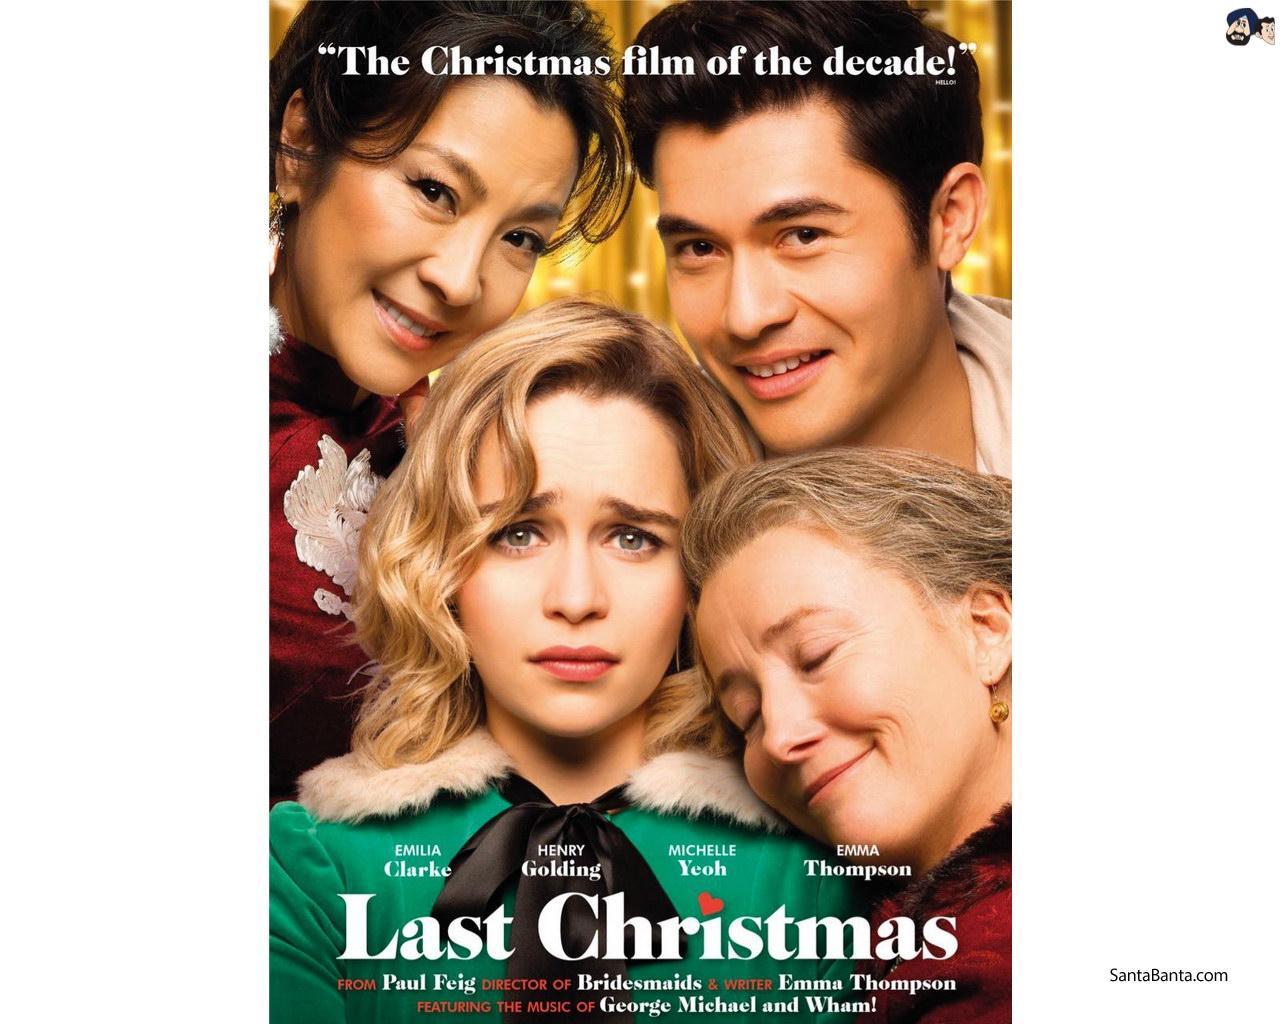 Last Christmas Movie 2019 Wallpapers